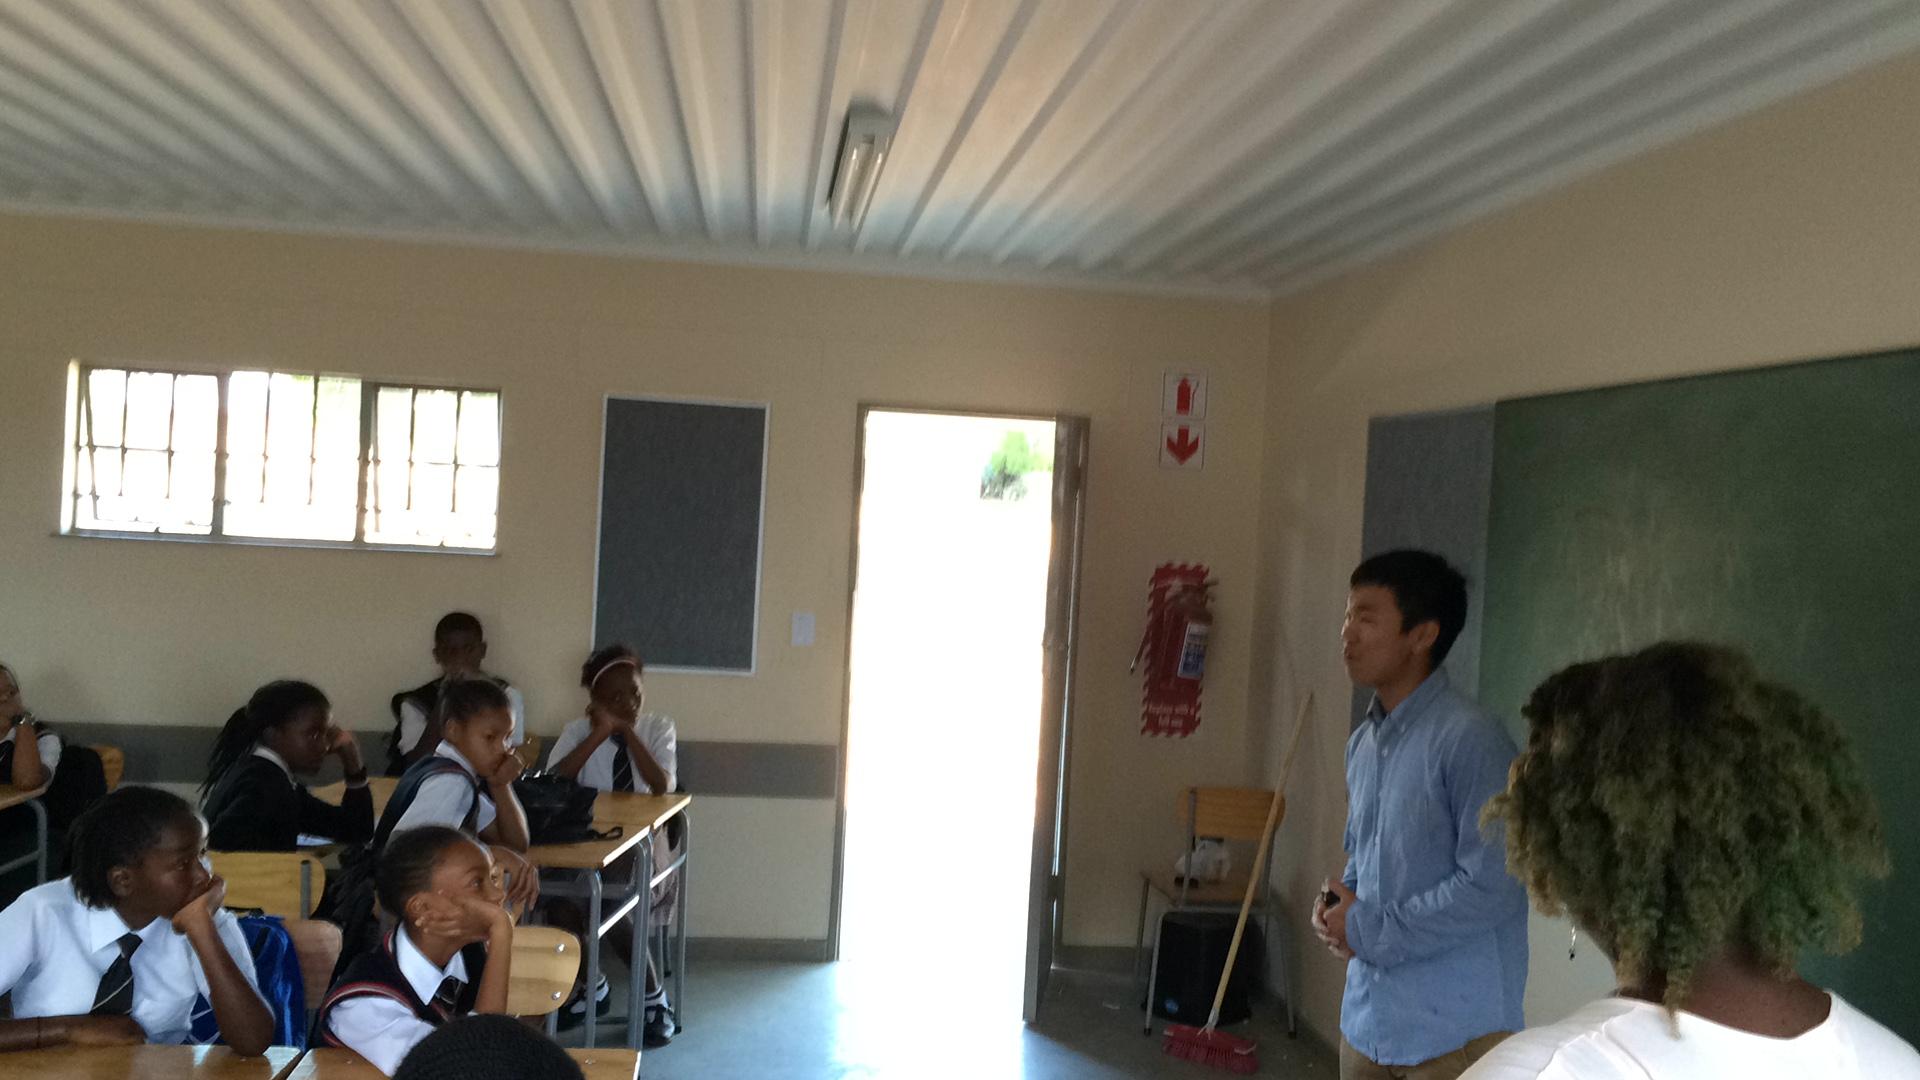 Kosei motivating the youth to follow their goals